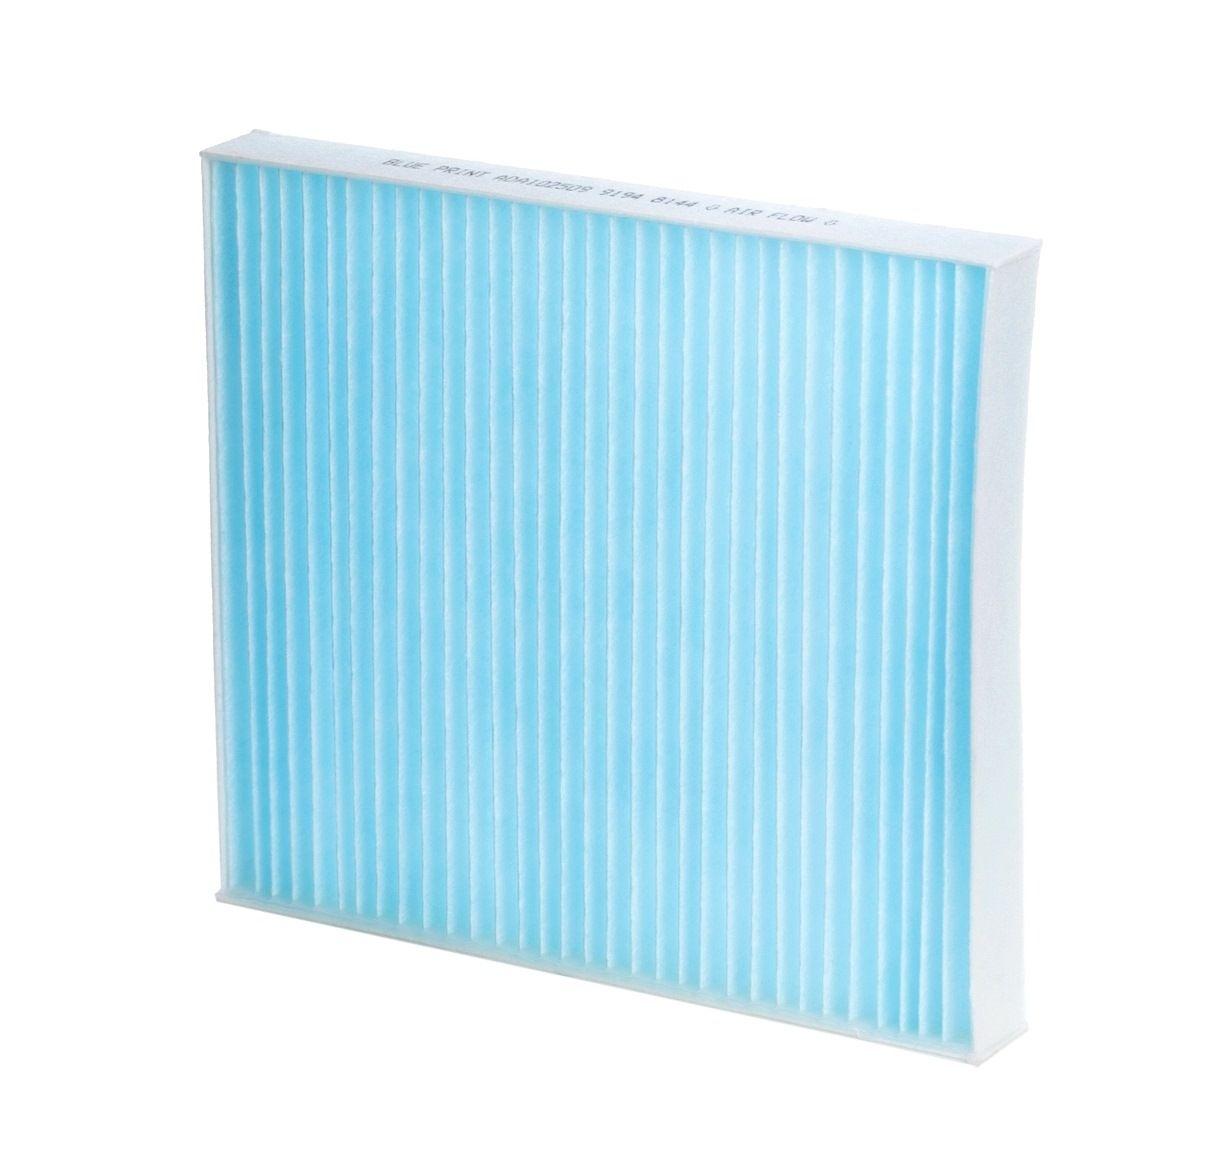 BLUE PRINT: Original Innenraumluftfilter ADA102509 (Breite: 194,5mm, Höhe: 25mm, Länge: 216mm)